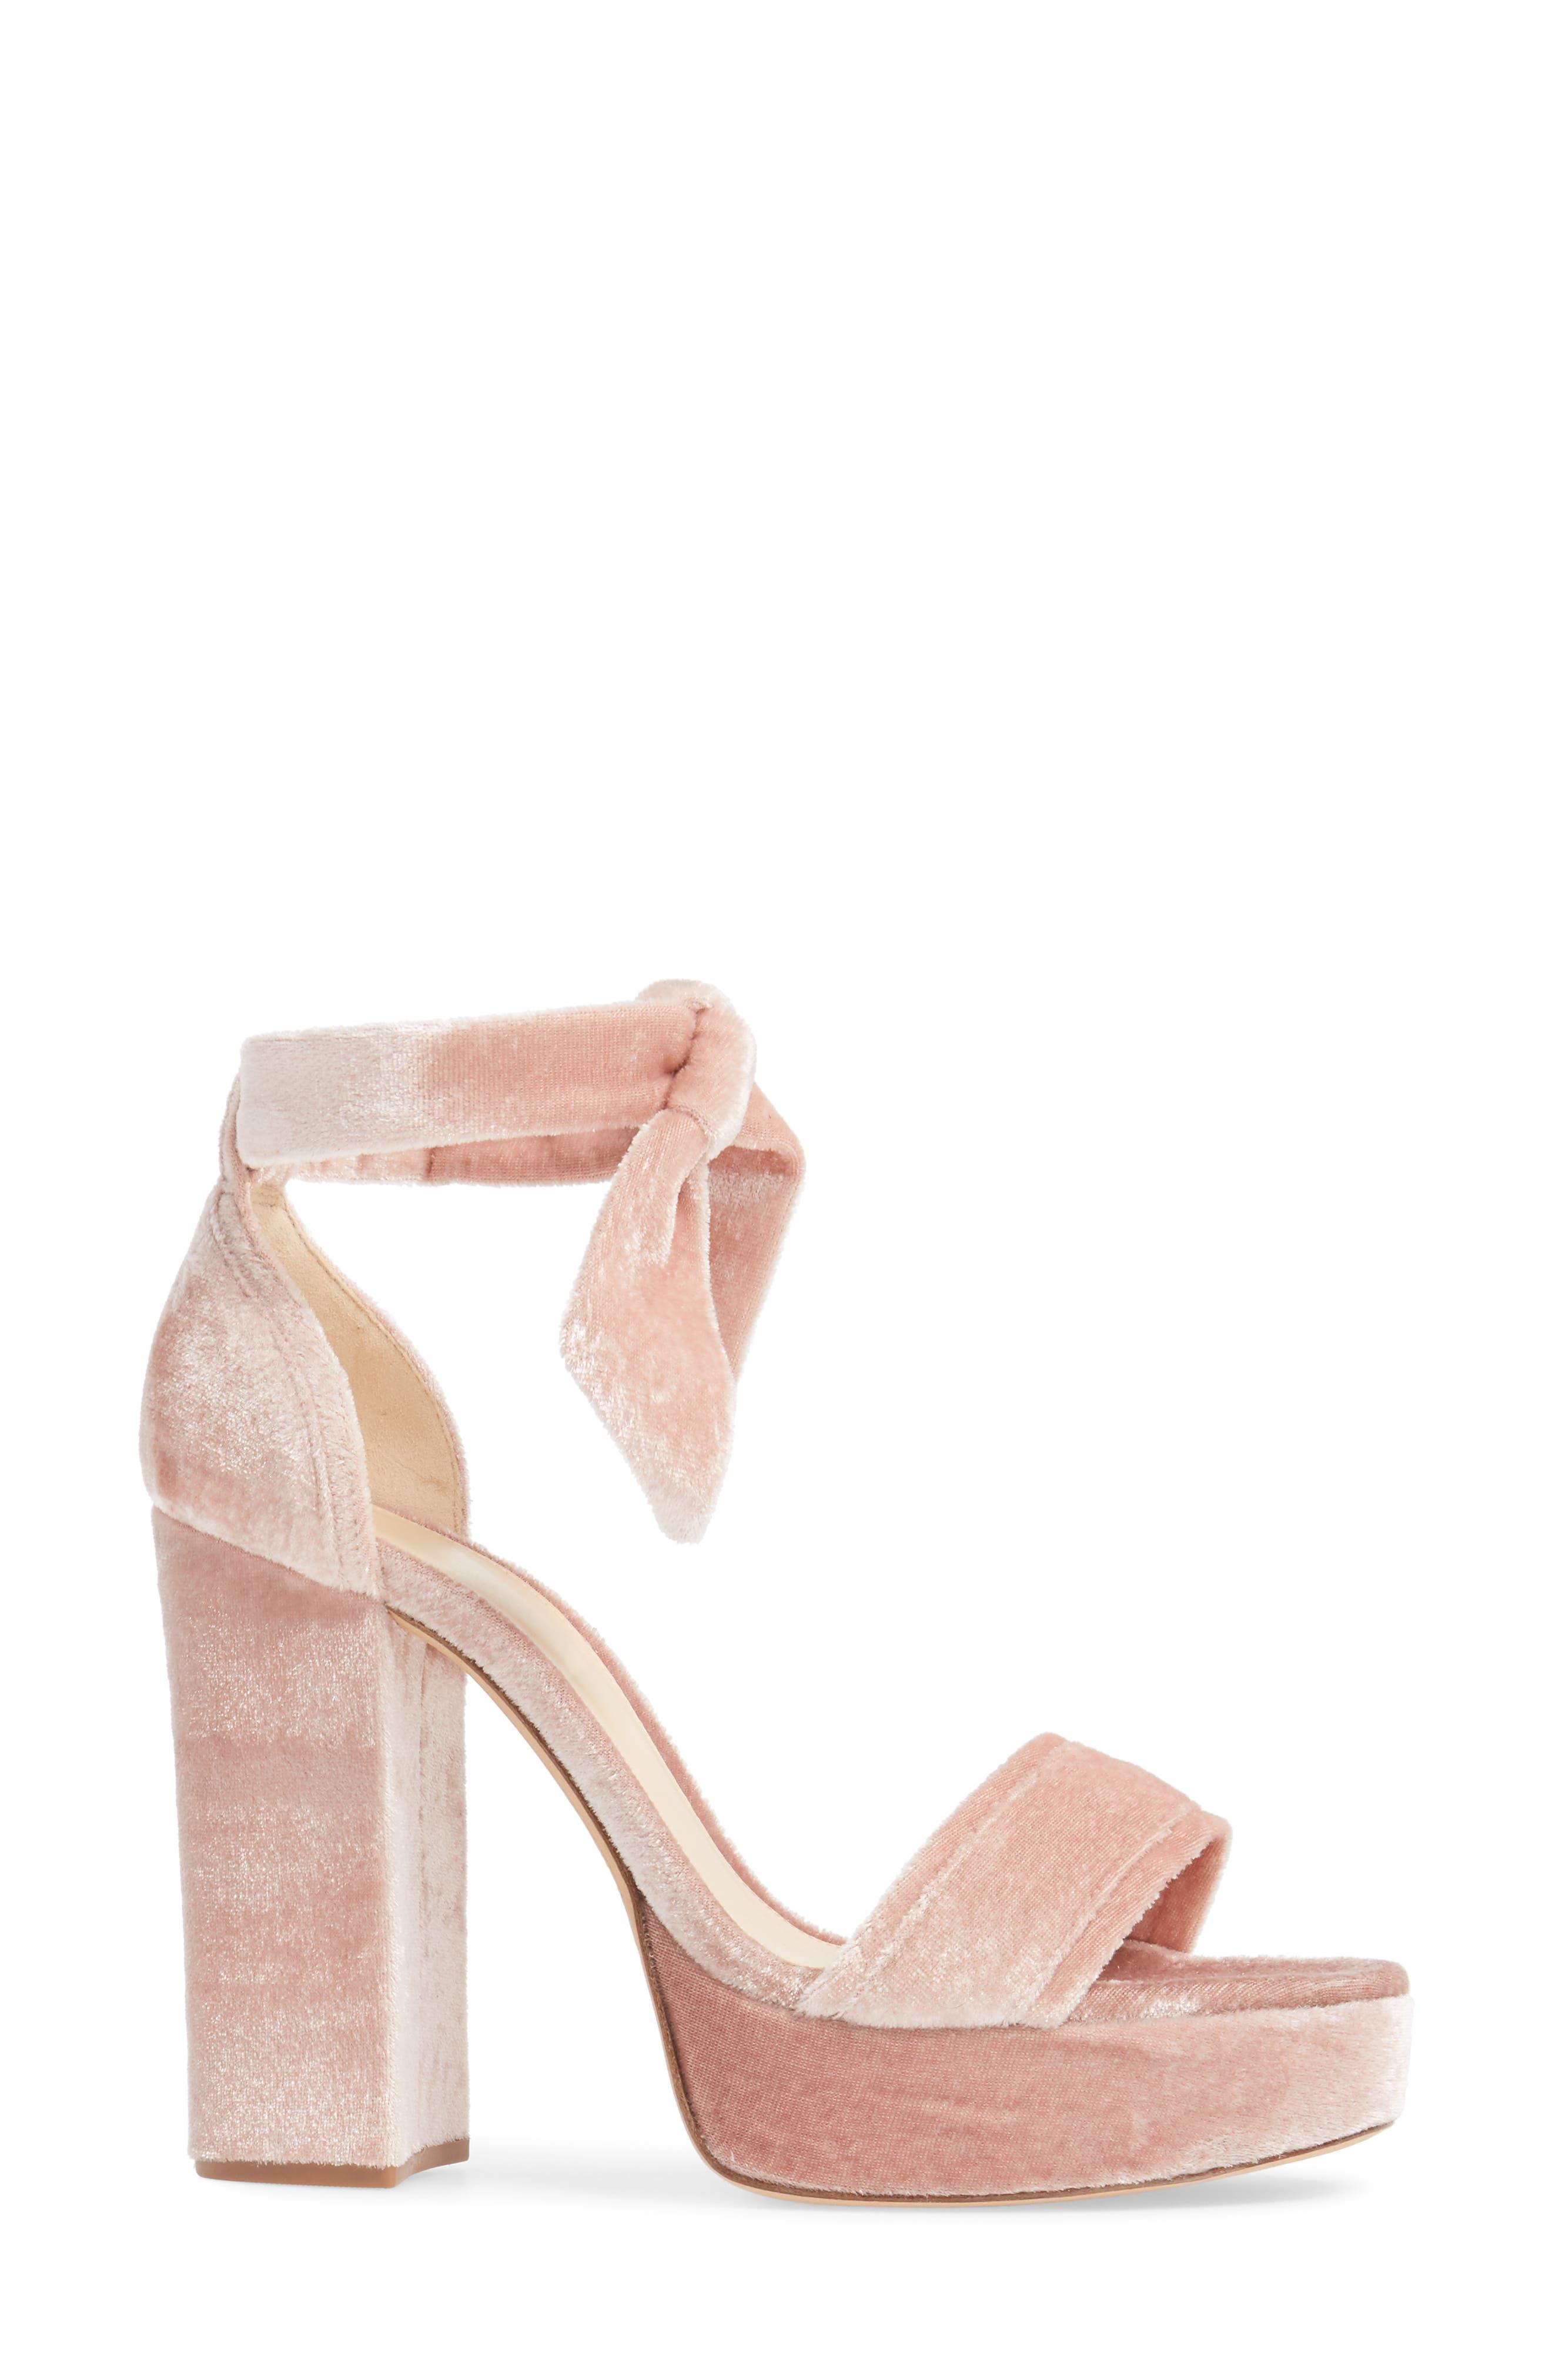 Celine Platform Sandal,                             Alternate thumbnail 6, color,